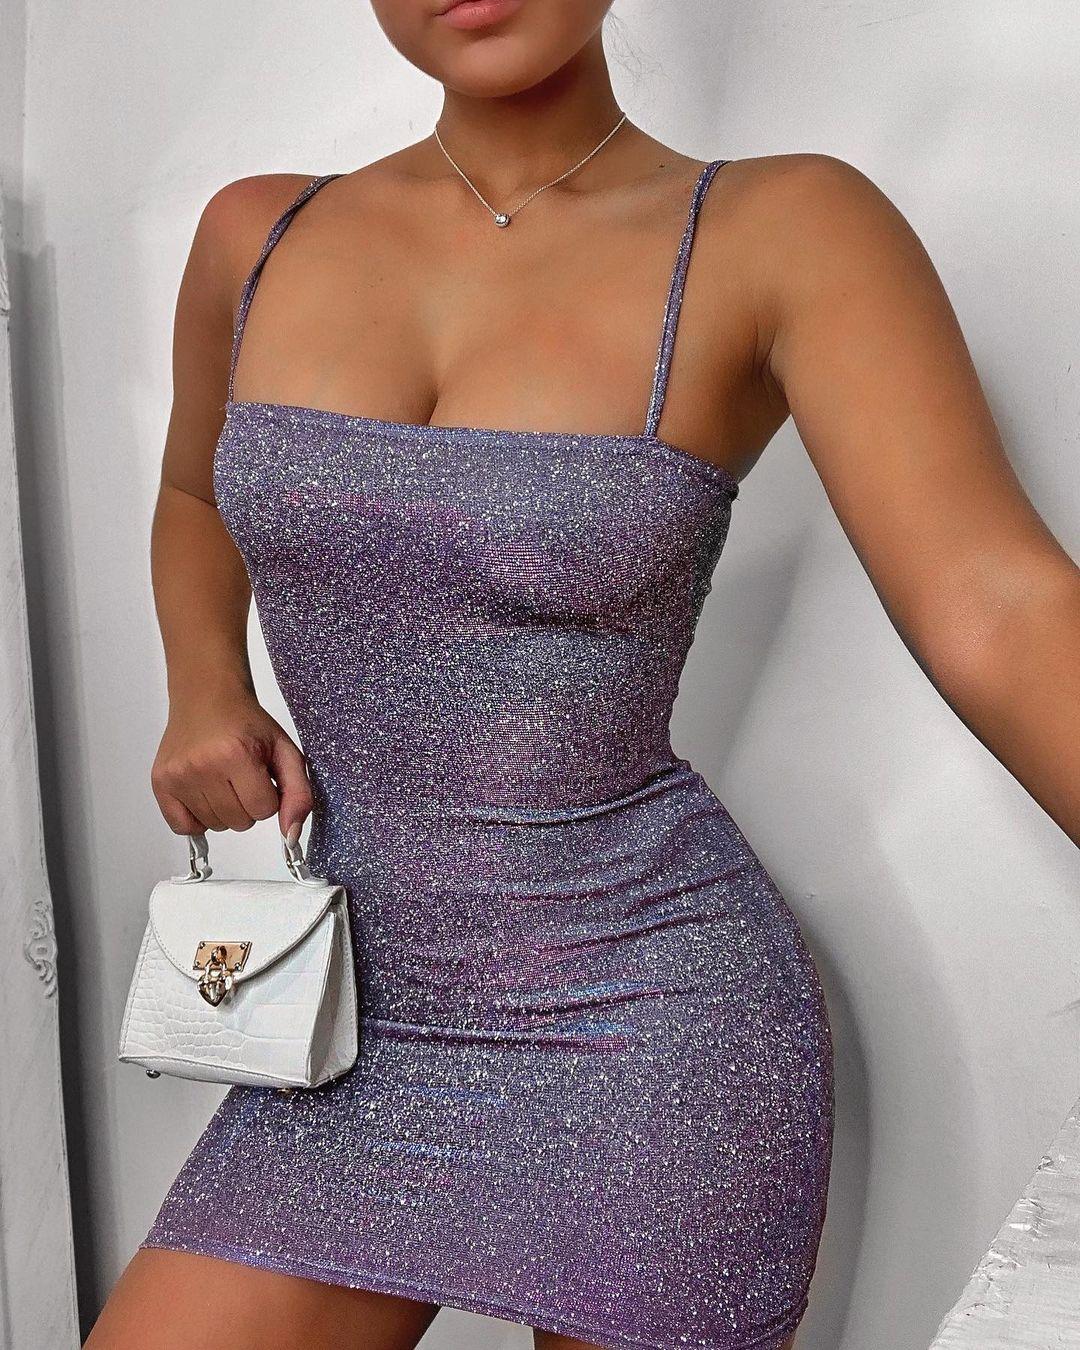 misspap 80048096 734660403723733 595658545704671099 n 1 Alternatives to the LBD (Little Black Dress)